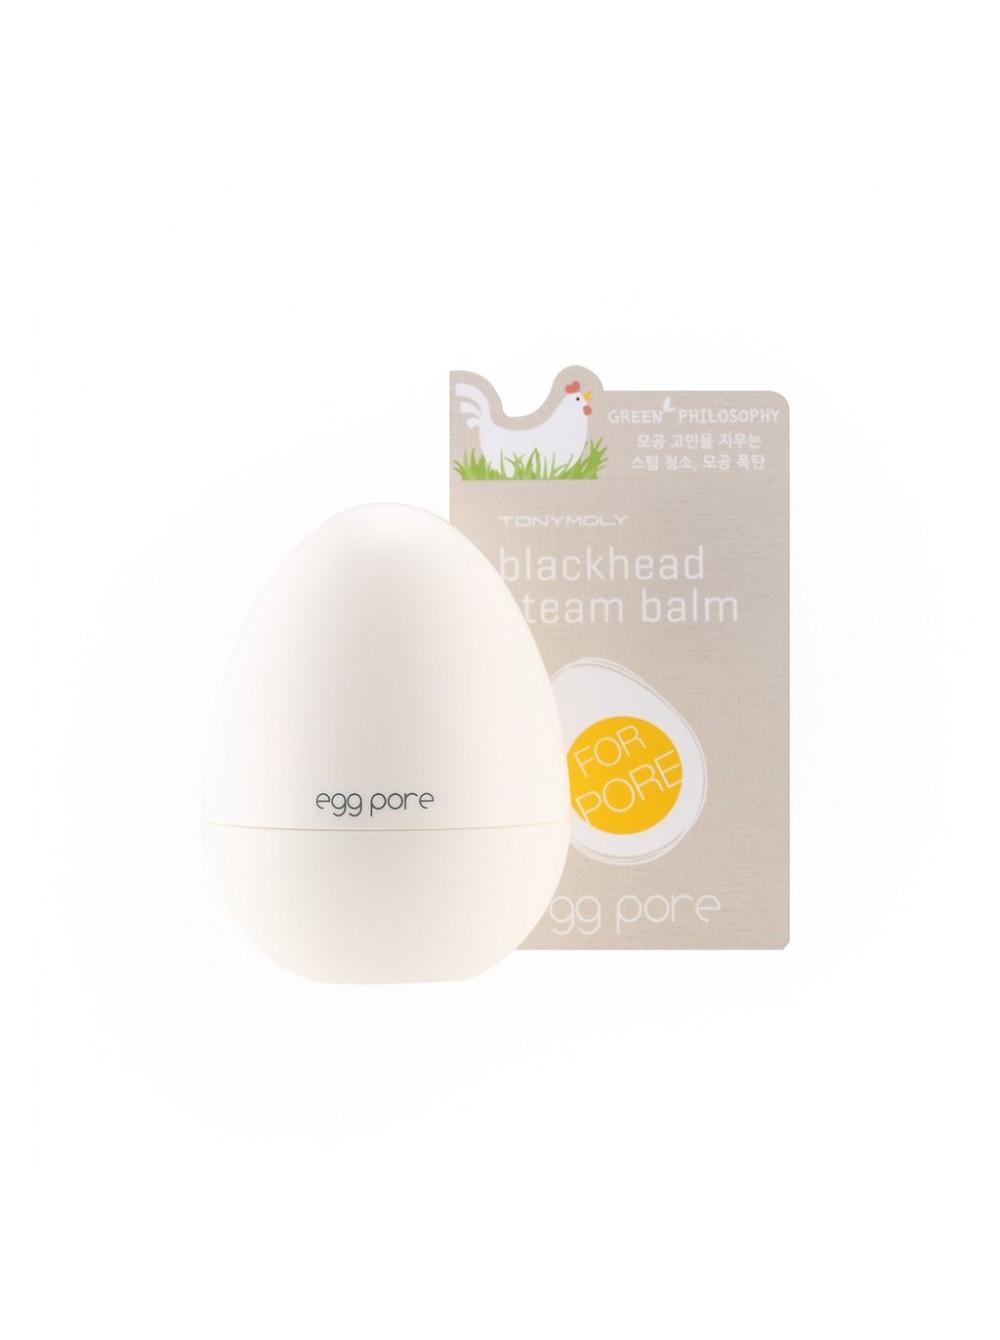 Tony Moly Egg Pore Blackhead Steam Balm